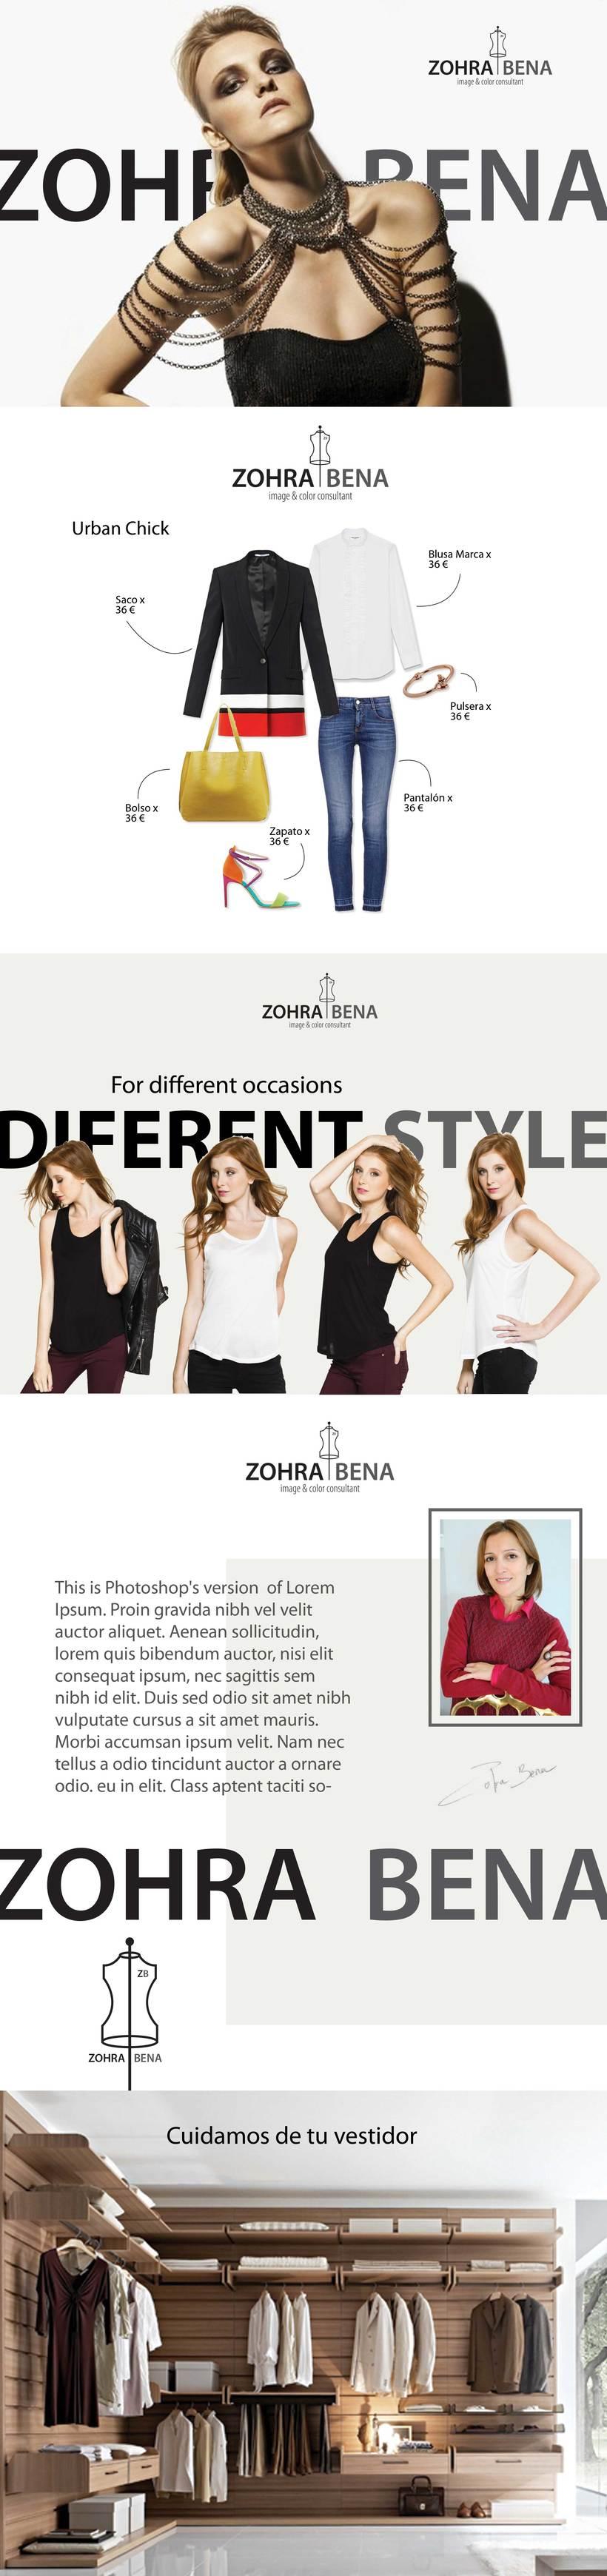 Zohra Bena - Identidad Corporativa - Logo 0